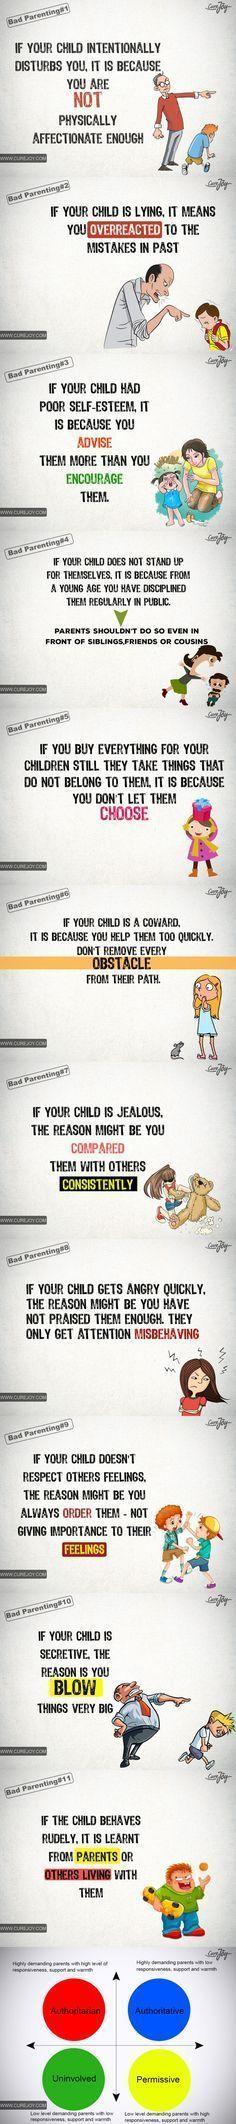 Found parents some advice, trust me I'm a psychologist #MarriageAdviceTrust